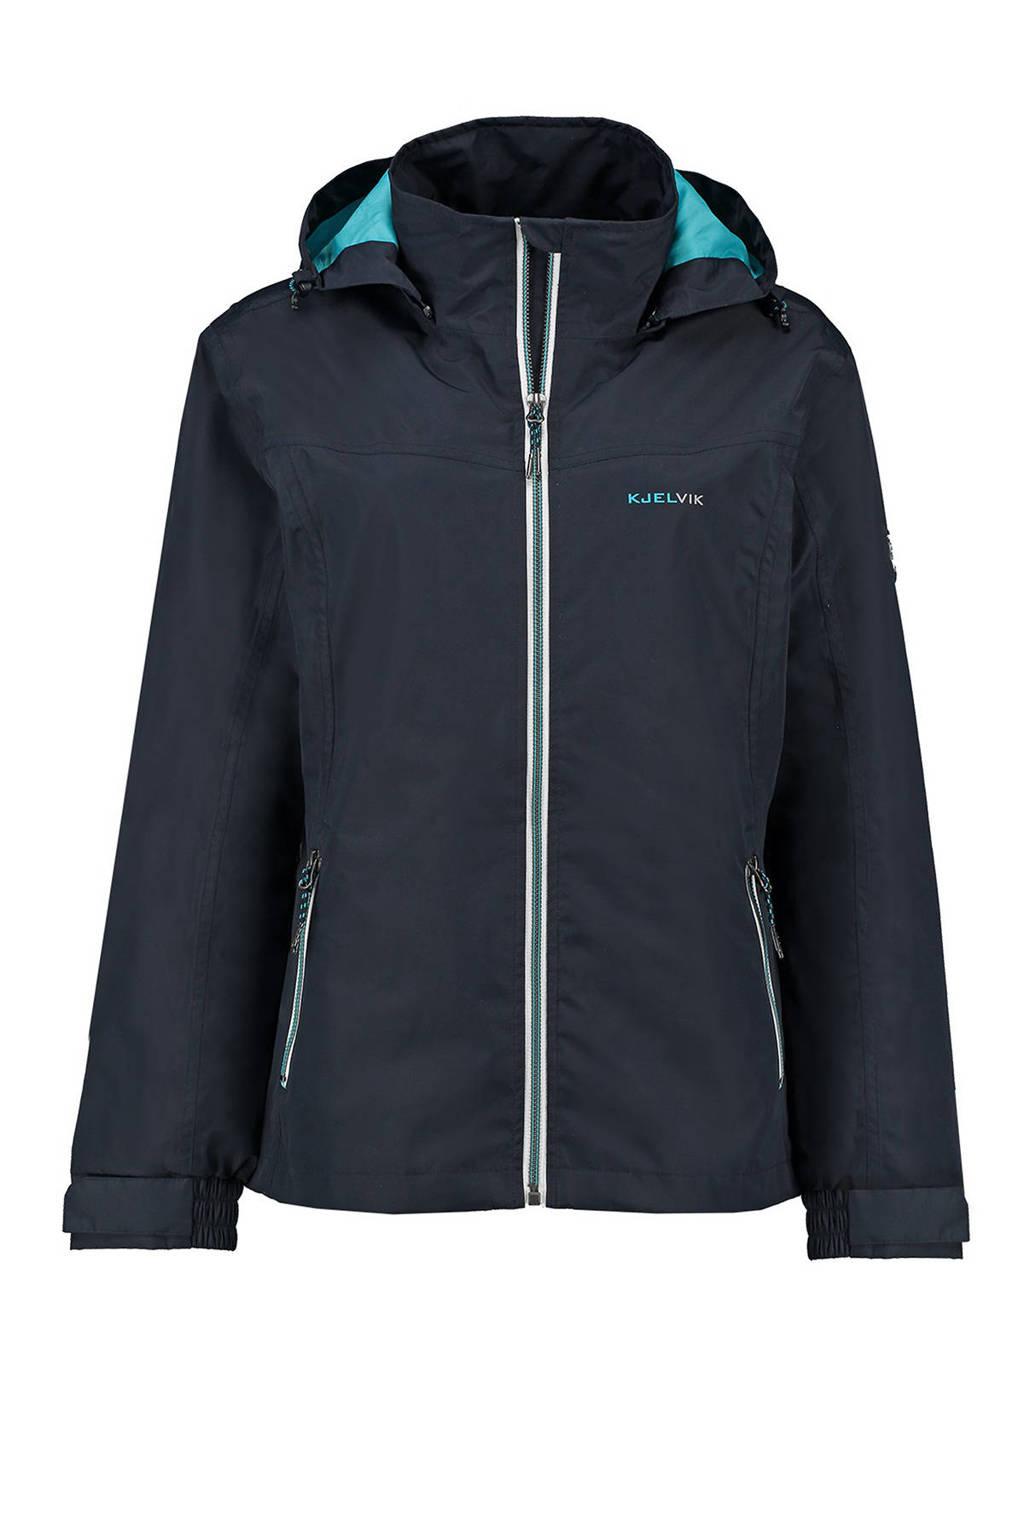 Kjelvik outdoor jas donkerblauw, Navy